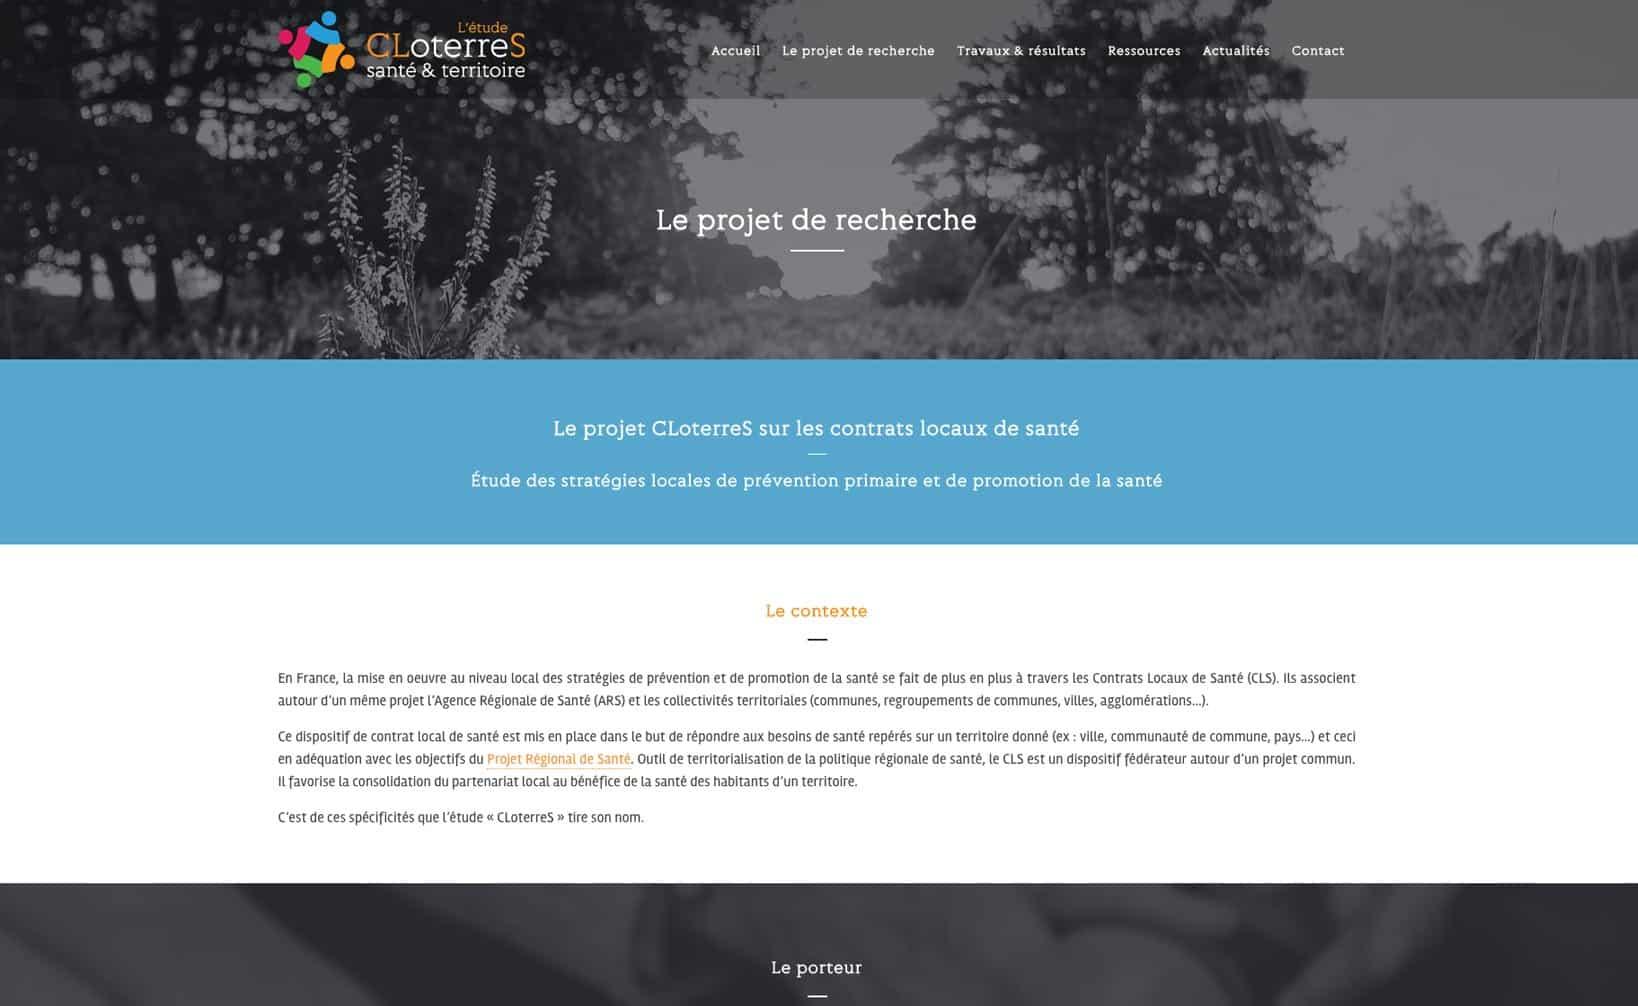 Site web CLoterreS - vue desktop 2